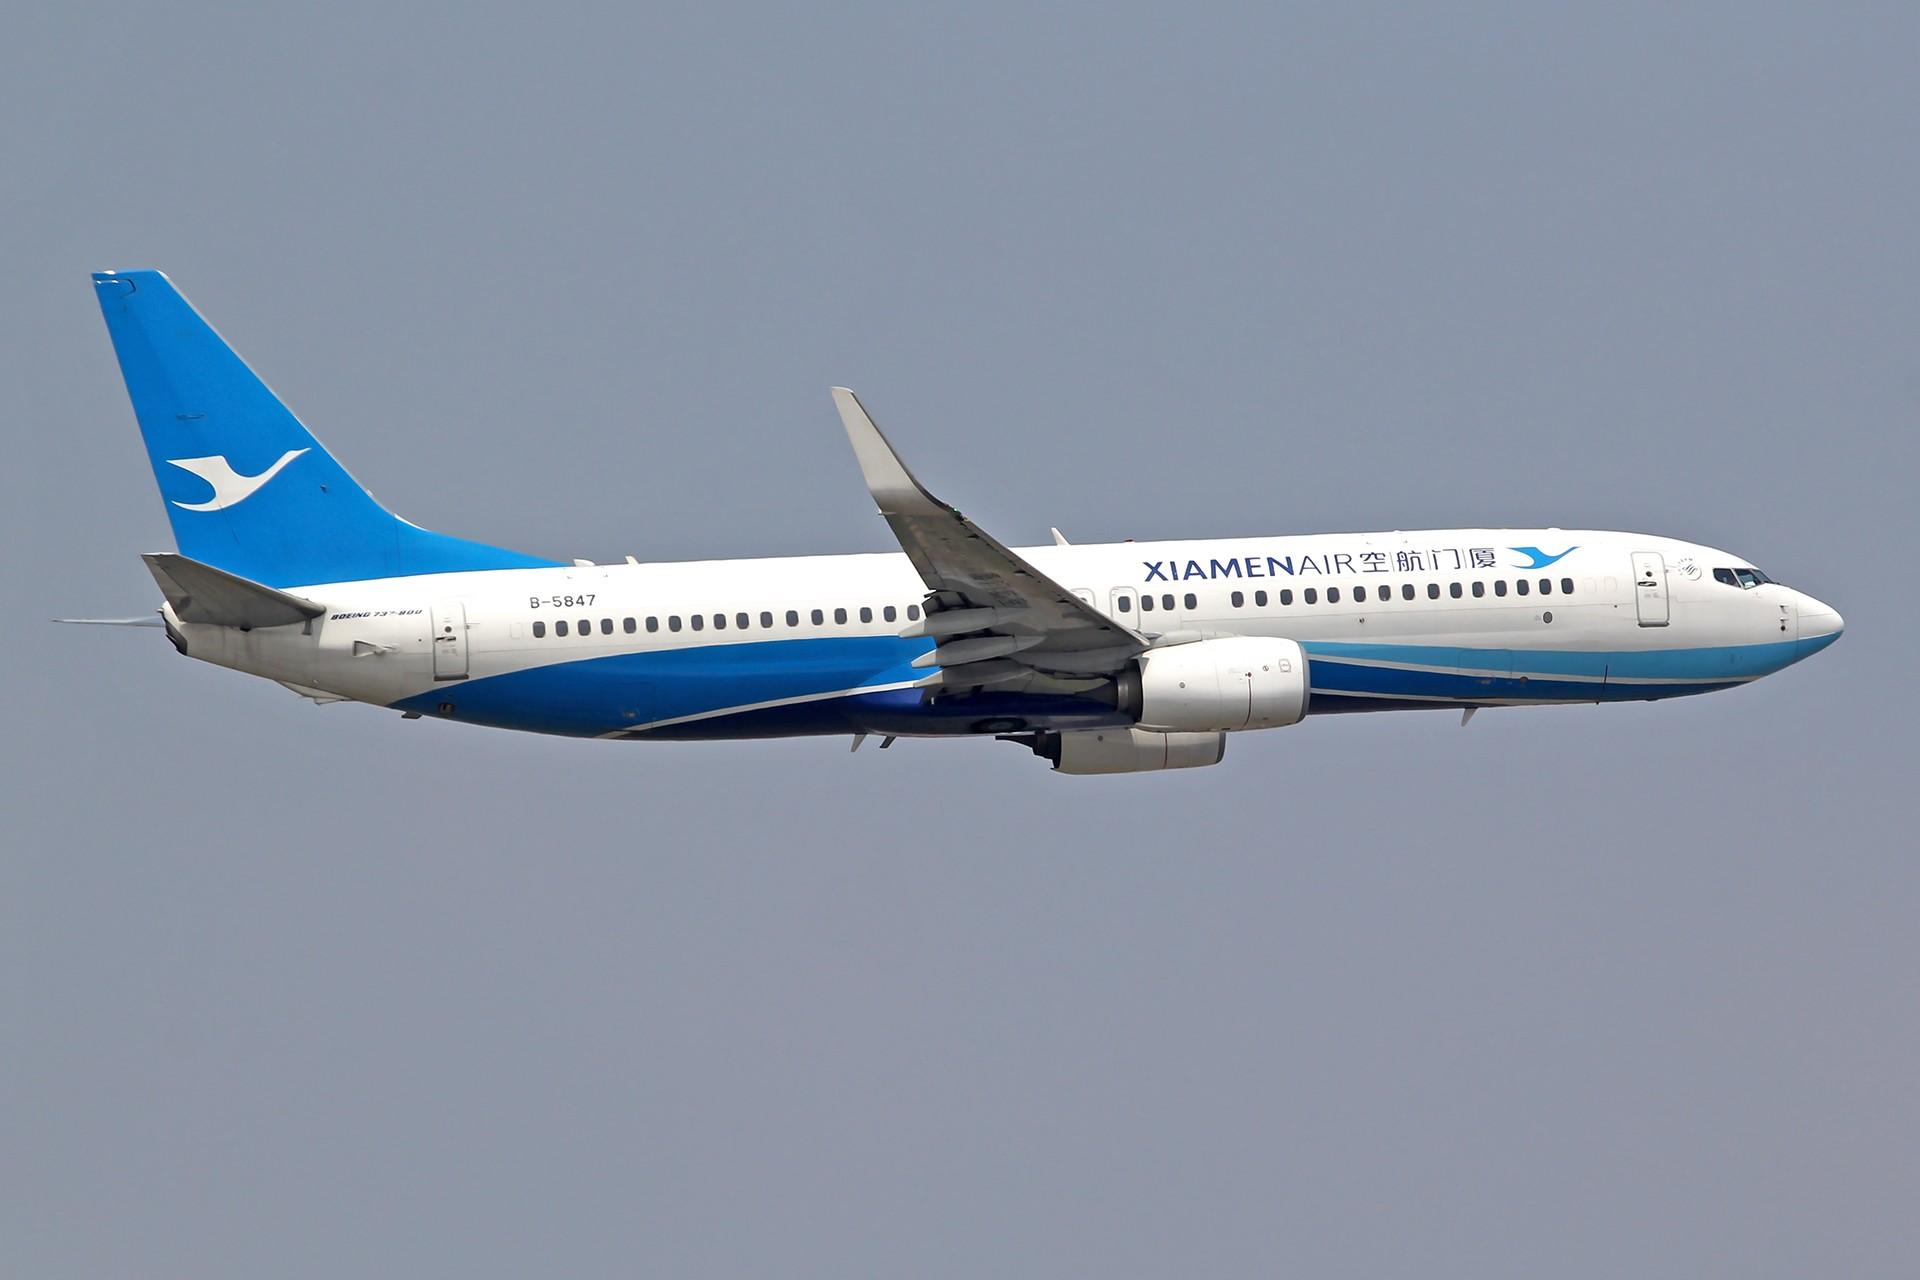 Re:[原创][DLC]雨过天晴,春意盎然…….. BOEING 737-800 B-5847 中国大连周水子国际机场